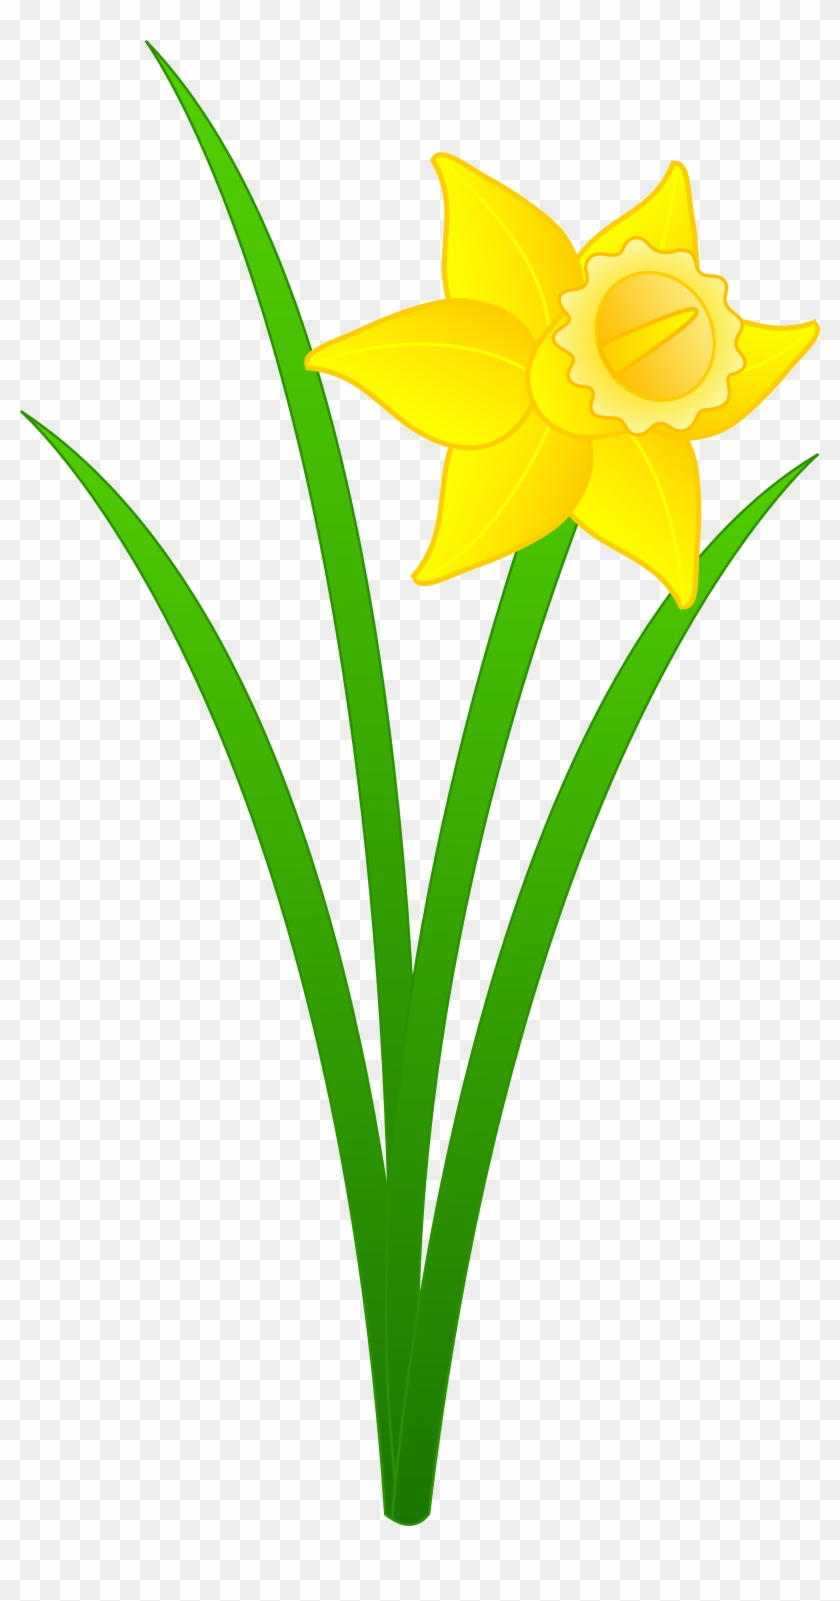 Daffodil Flower Clip Art - Daffodil Flower Clip Art #25077